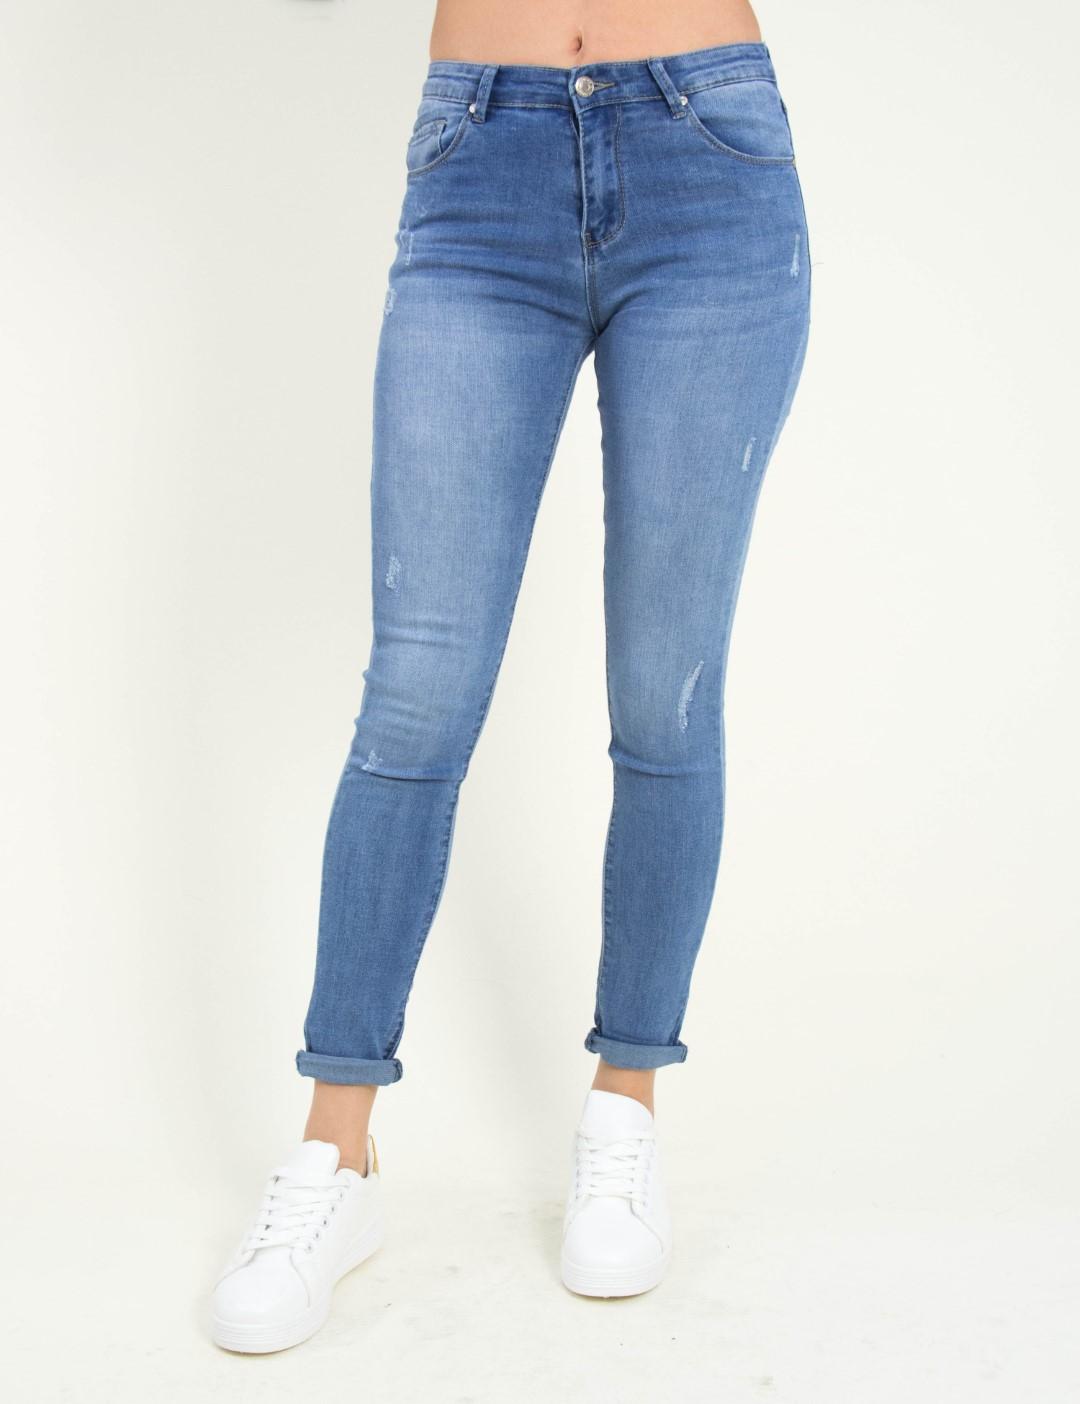 273f5e16a5c9 Γυναικείο μπλε ανοιχτόχρωμο τζιν παντελόνι σωλήνας CY1111